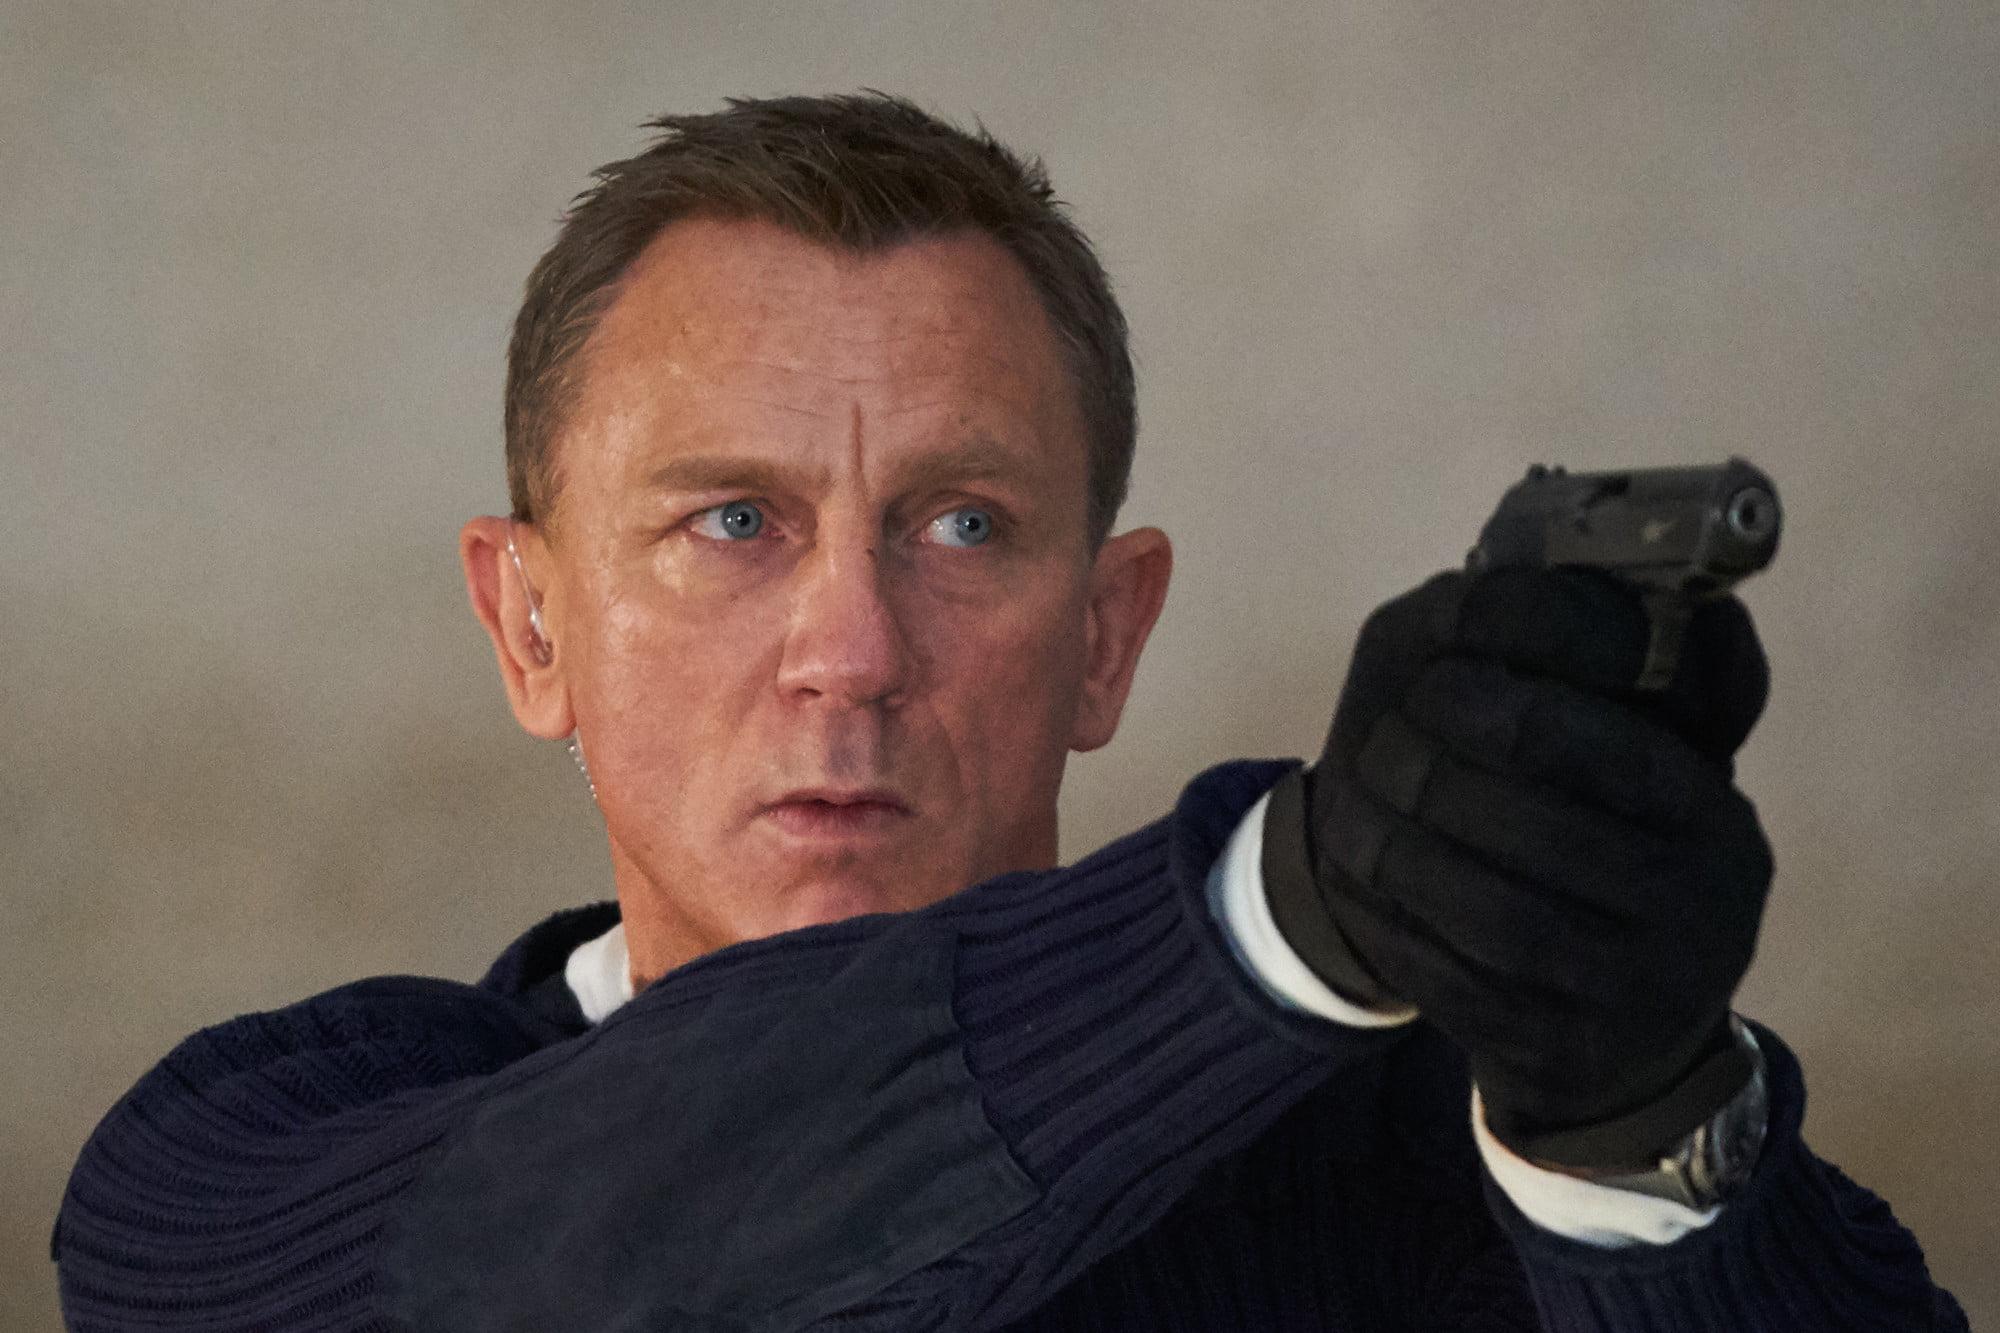 De officiële James Bond 'No Time To Die' trailer